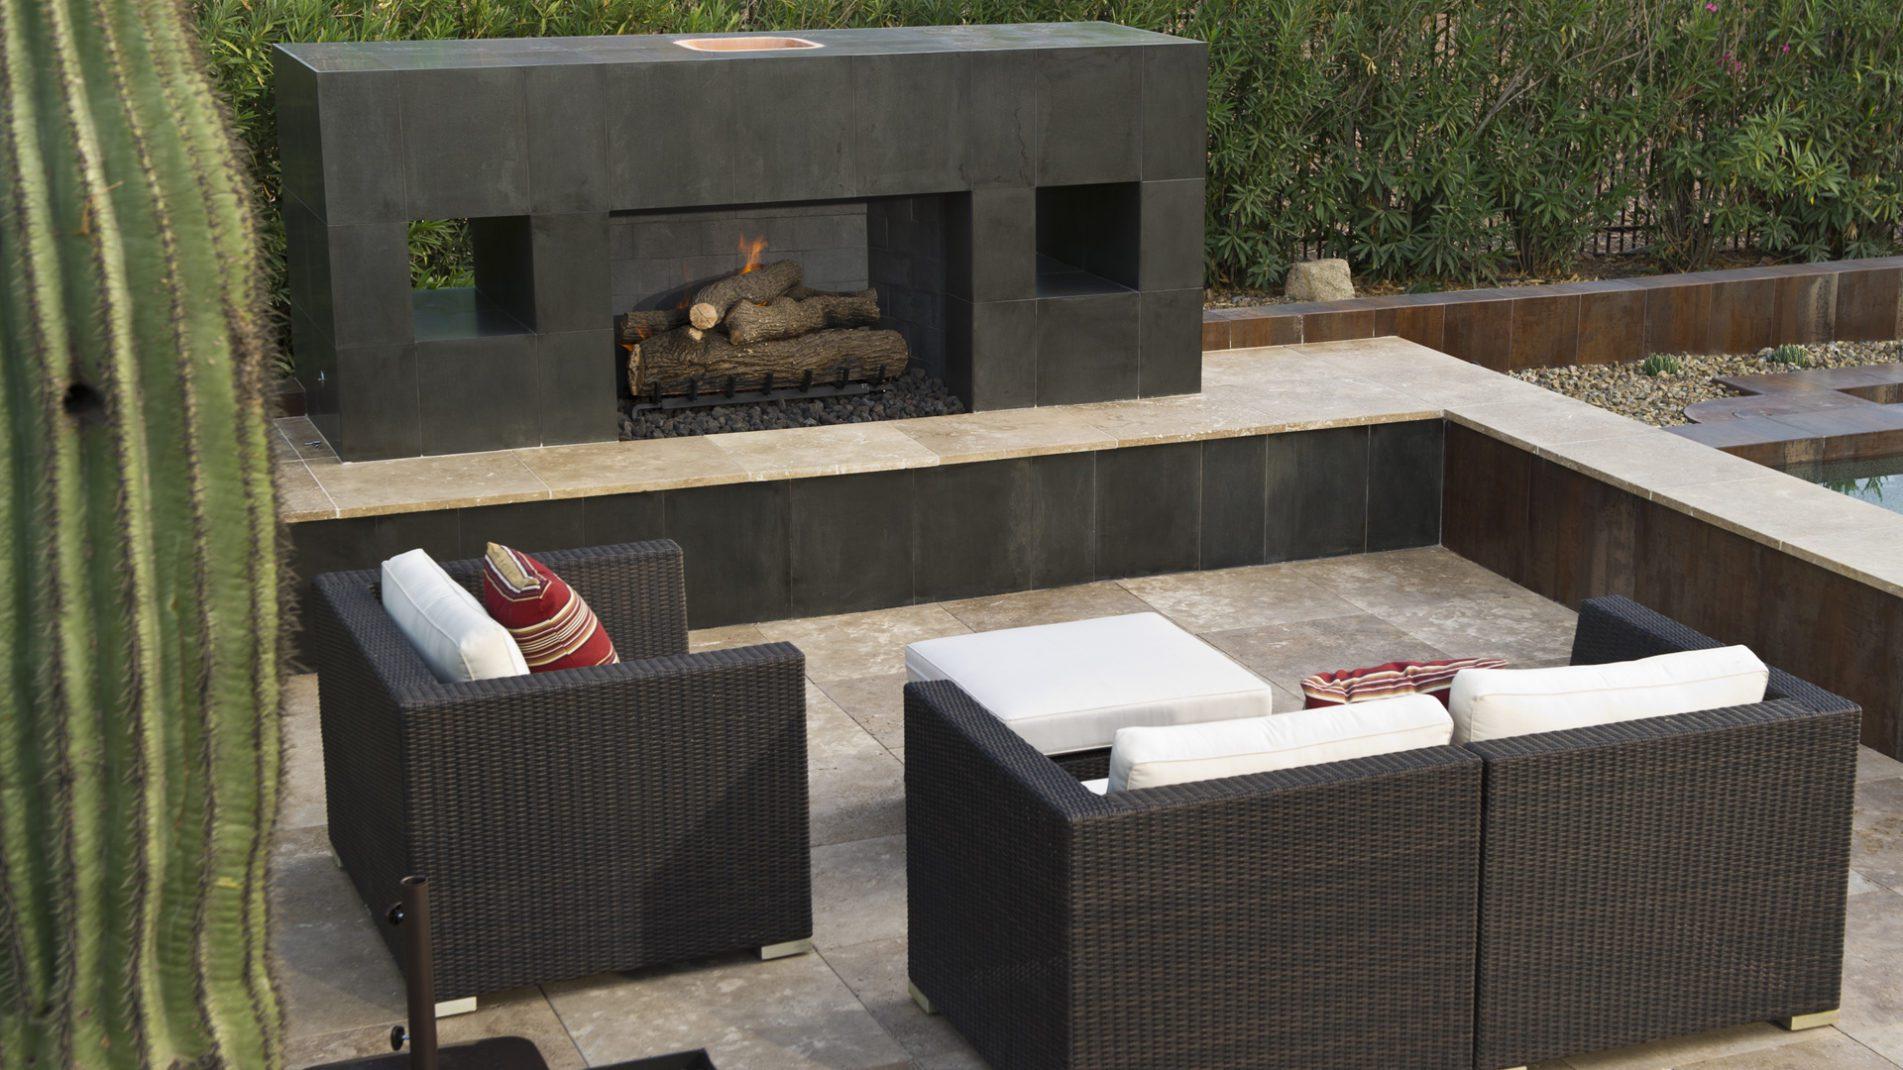 Camelback, Concrete & Copper Ultimate Backyard